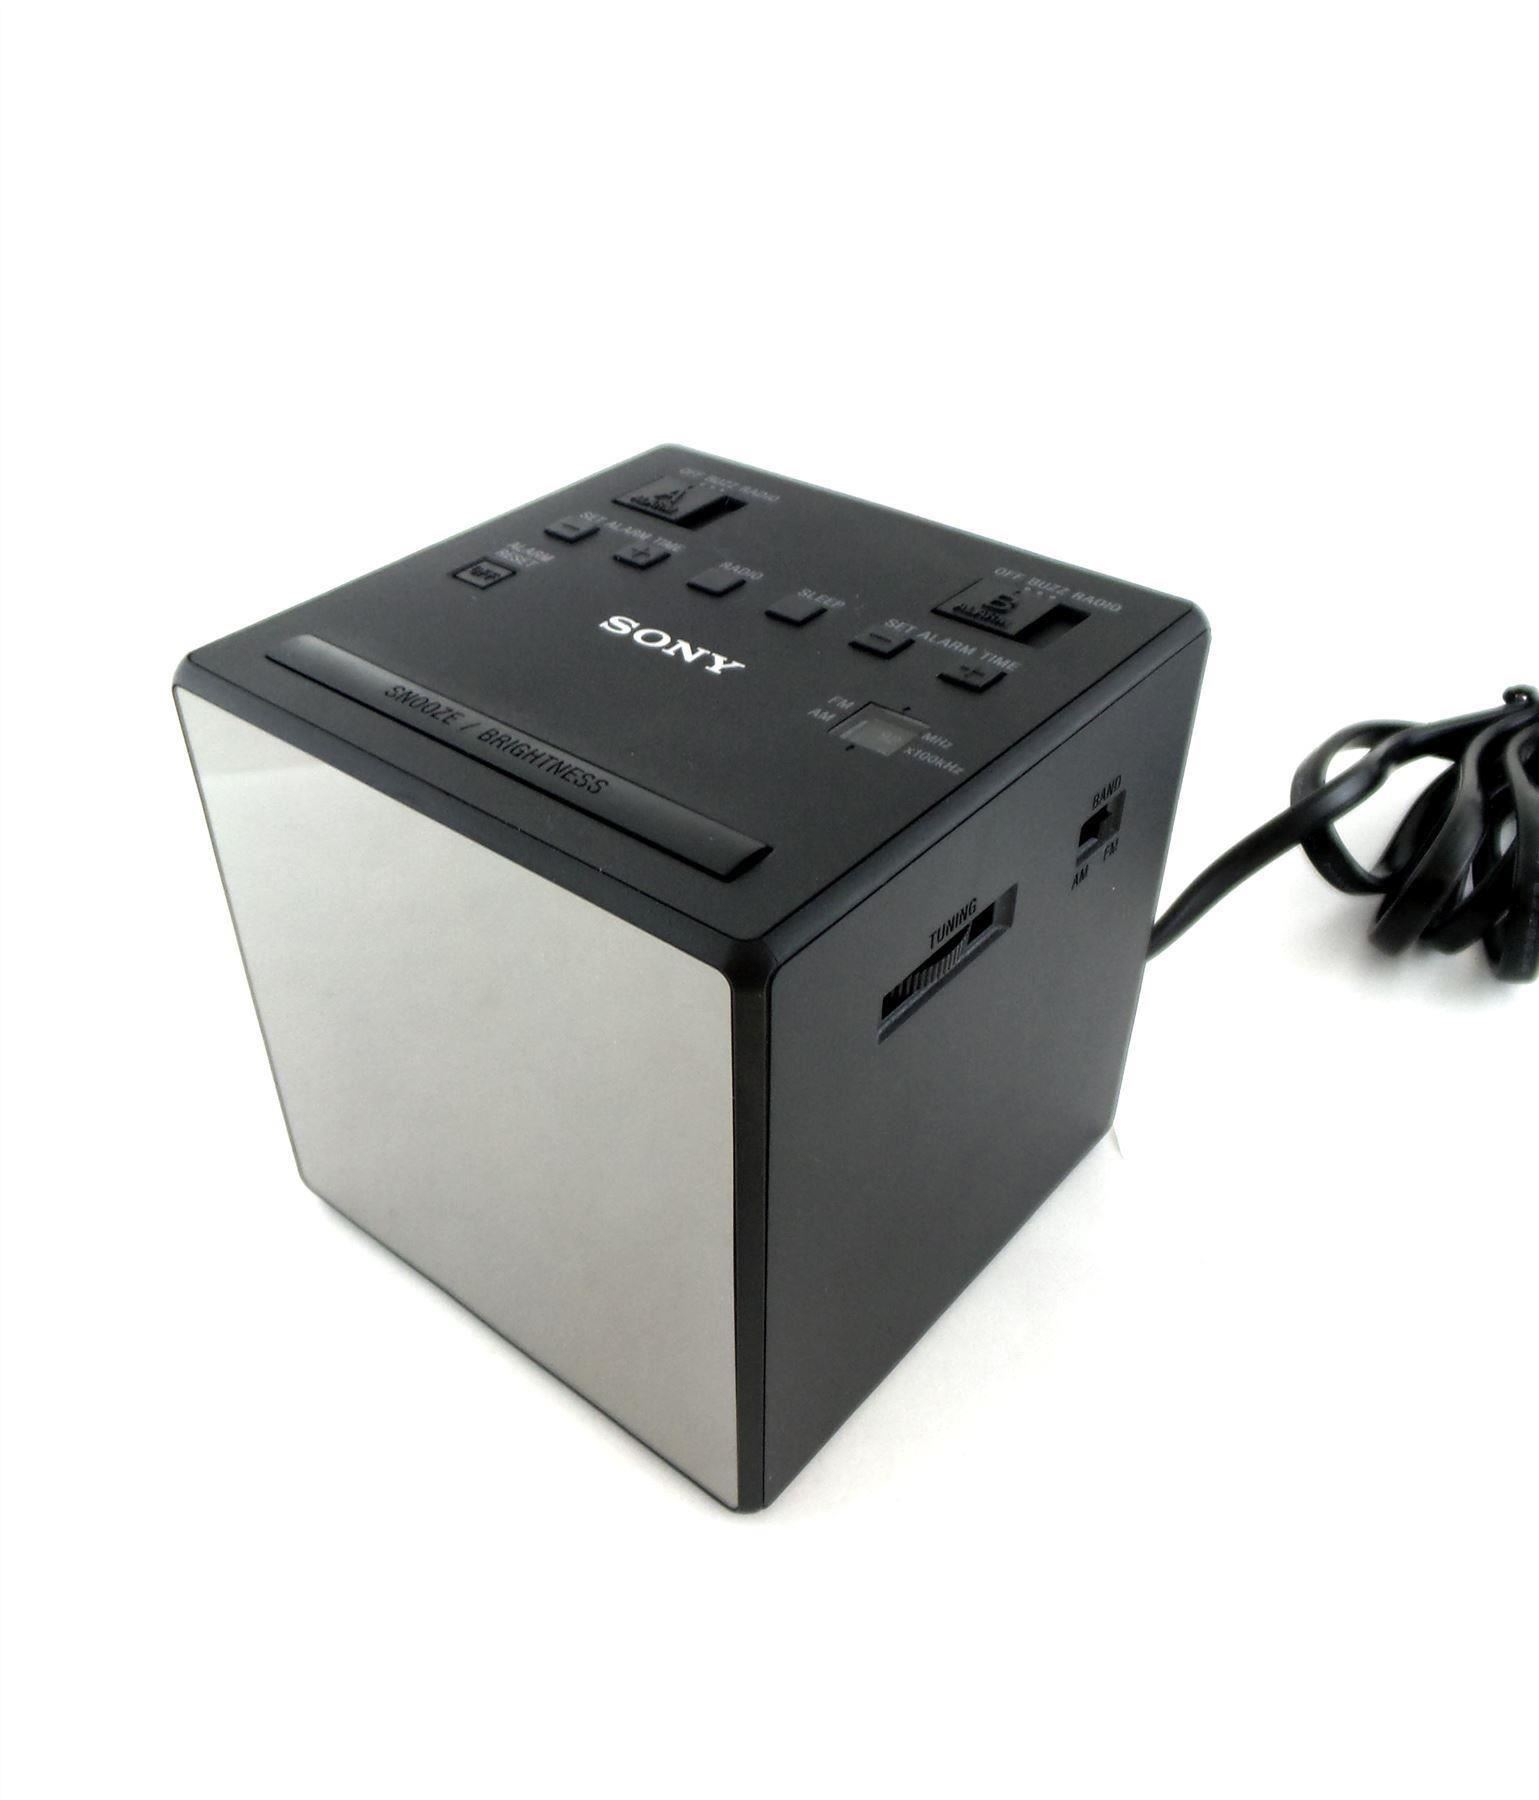 sony icf c1t alarm clock radio fm am dual alarm dst black ebay. Black Bedroom Furniture Sets. Home Design Ideas